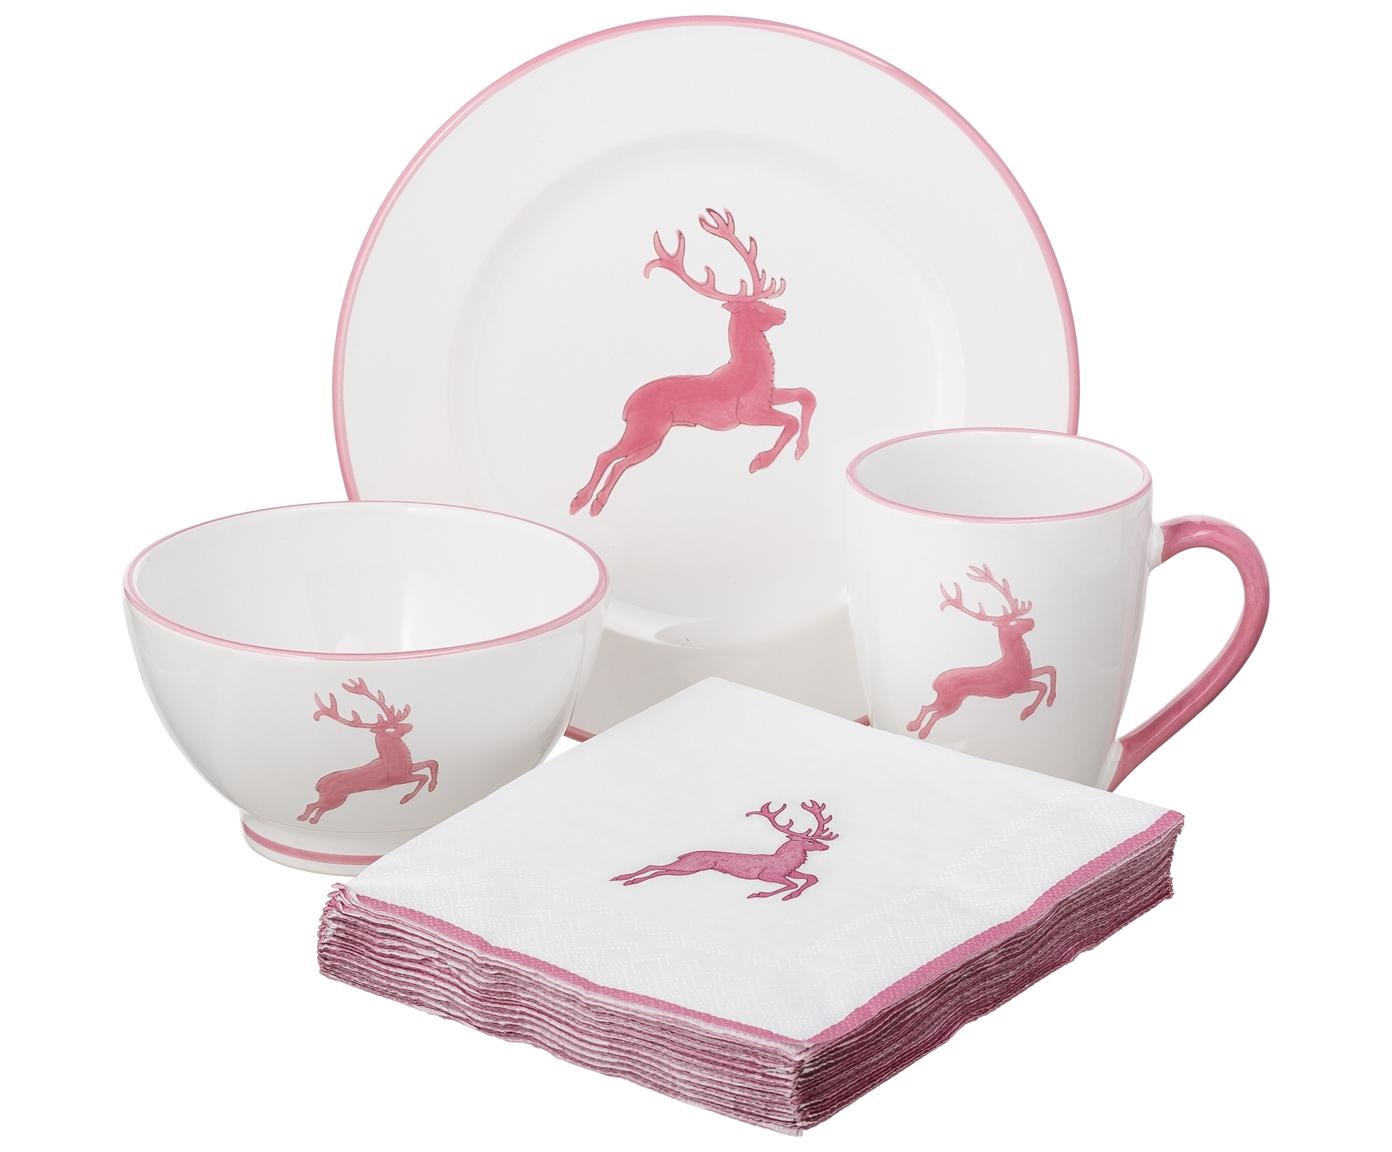 Frühstücks-Set Rosa Gourmet Hirsch, 4-tlg., Keramik, Rosa, Weiß, Sondergrößen